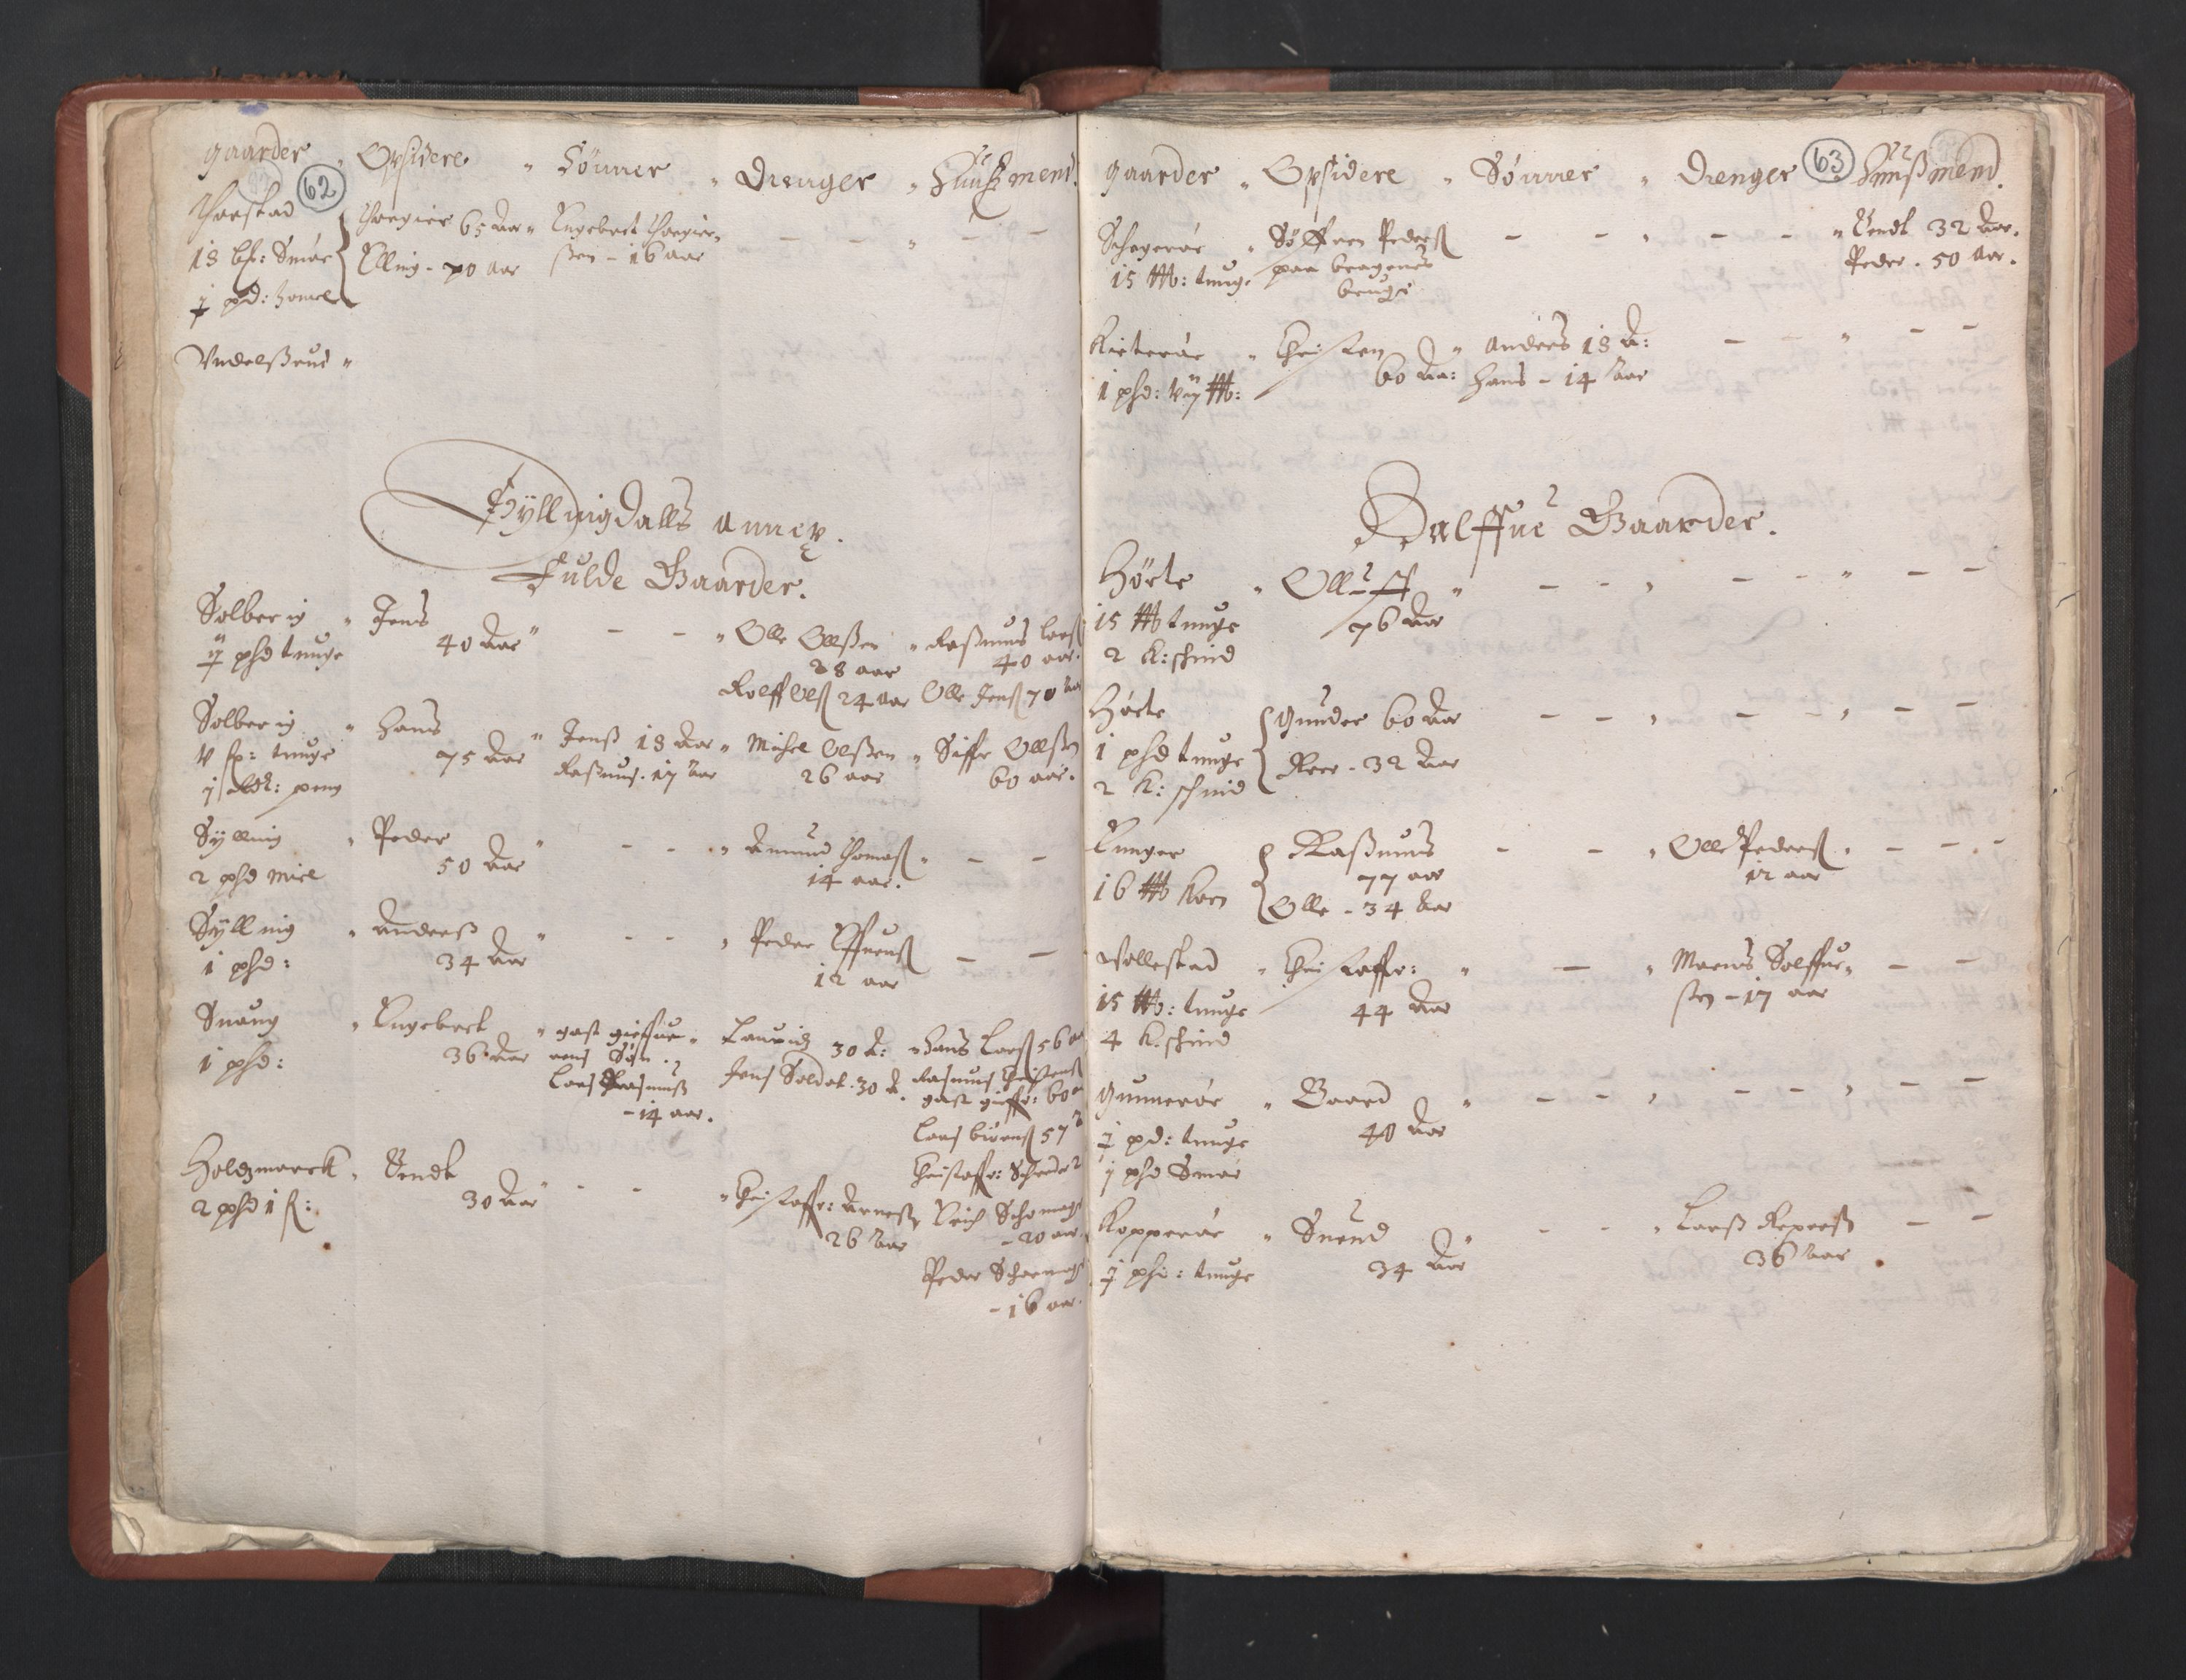 RA, Fogdenes og sorenskrivernes manntall 1664-1666, nr. 5: Fogderier (len og skipreider) i nåværende Buskerud fylke og Vestfold fylke, 1664, s. 62-63